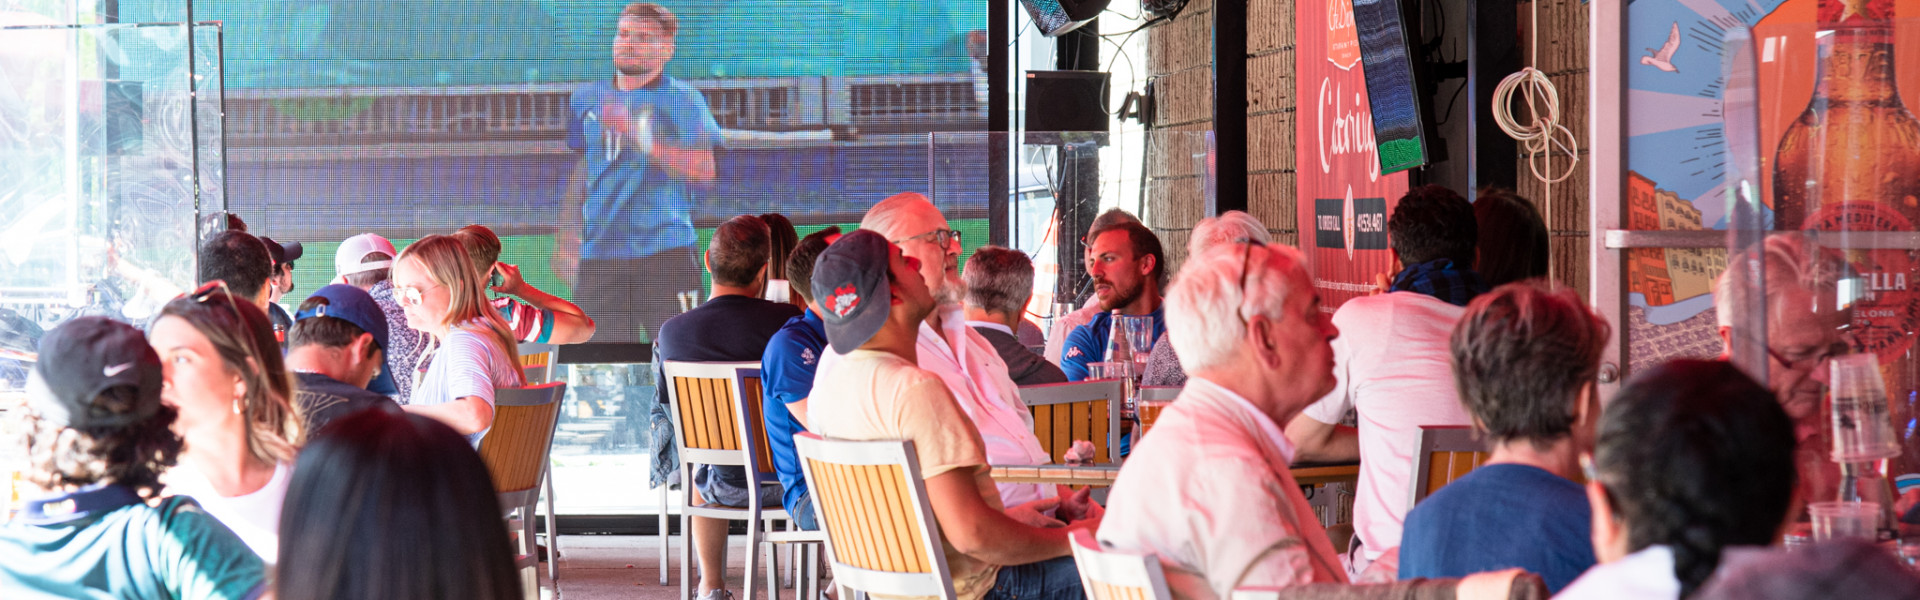 Uefa 2021 Italy Switzerland Dscalestudio 19 En